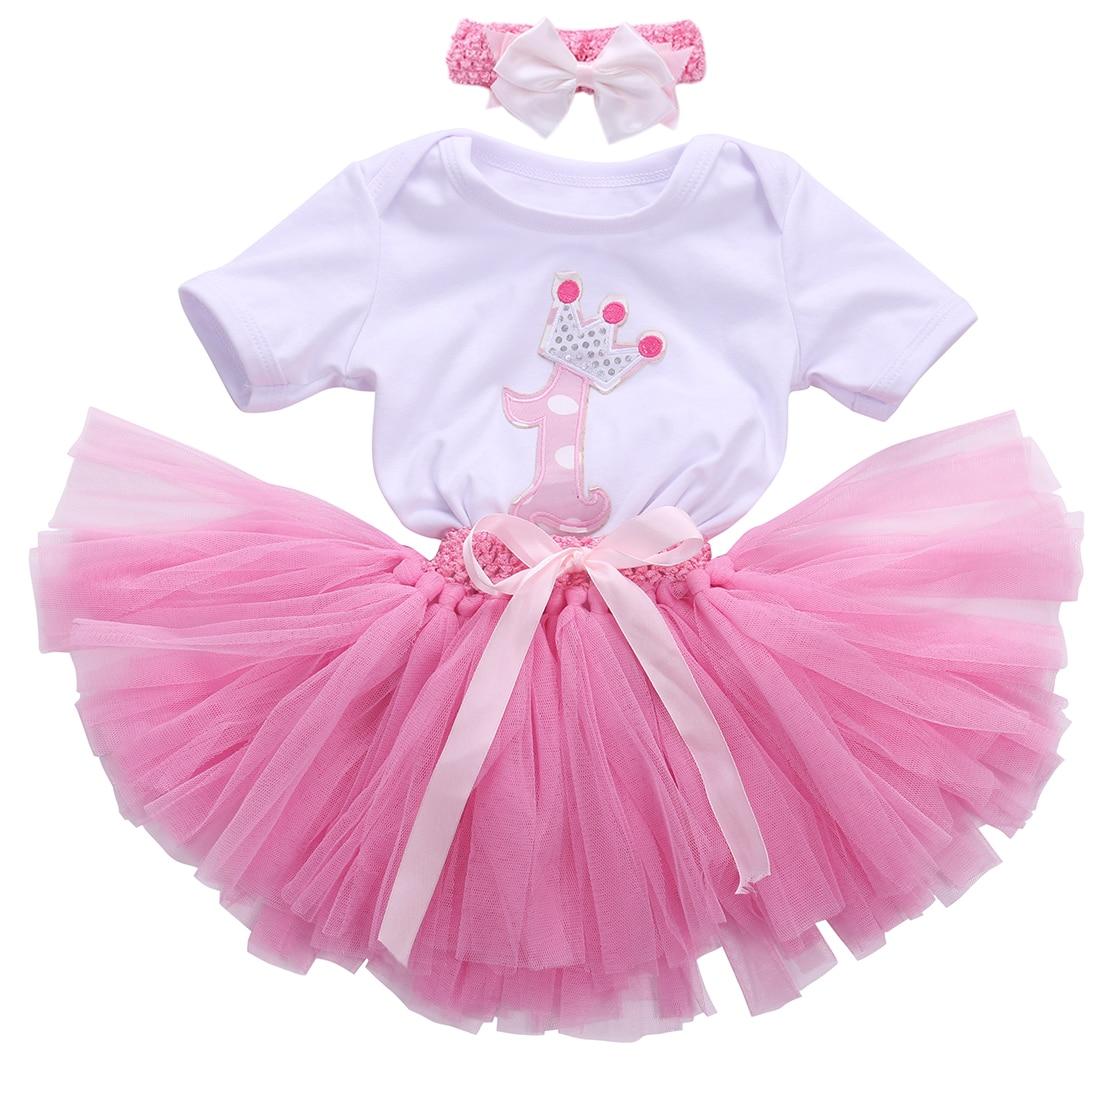 Baby Girl Clothes Set Hot Sale Birthday Clothes 3PCS Infant Baby Girl Bodysuit Top+Headband+Skirt Princess Tutu Skirt Outfit